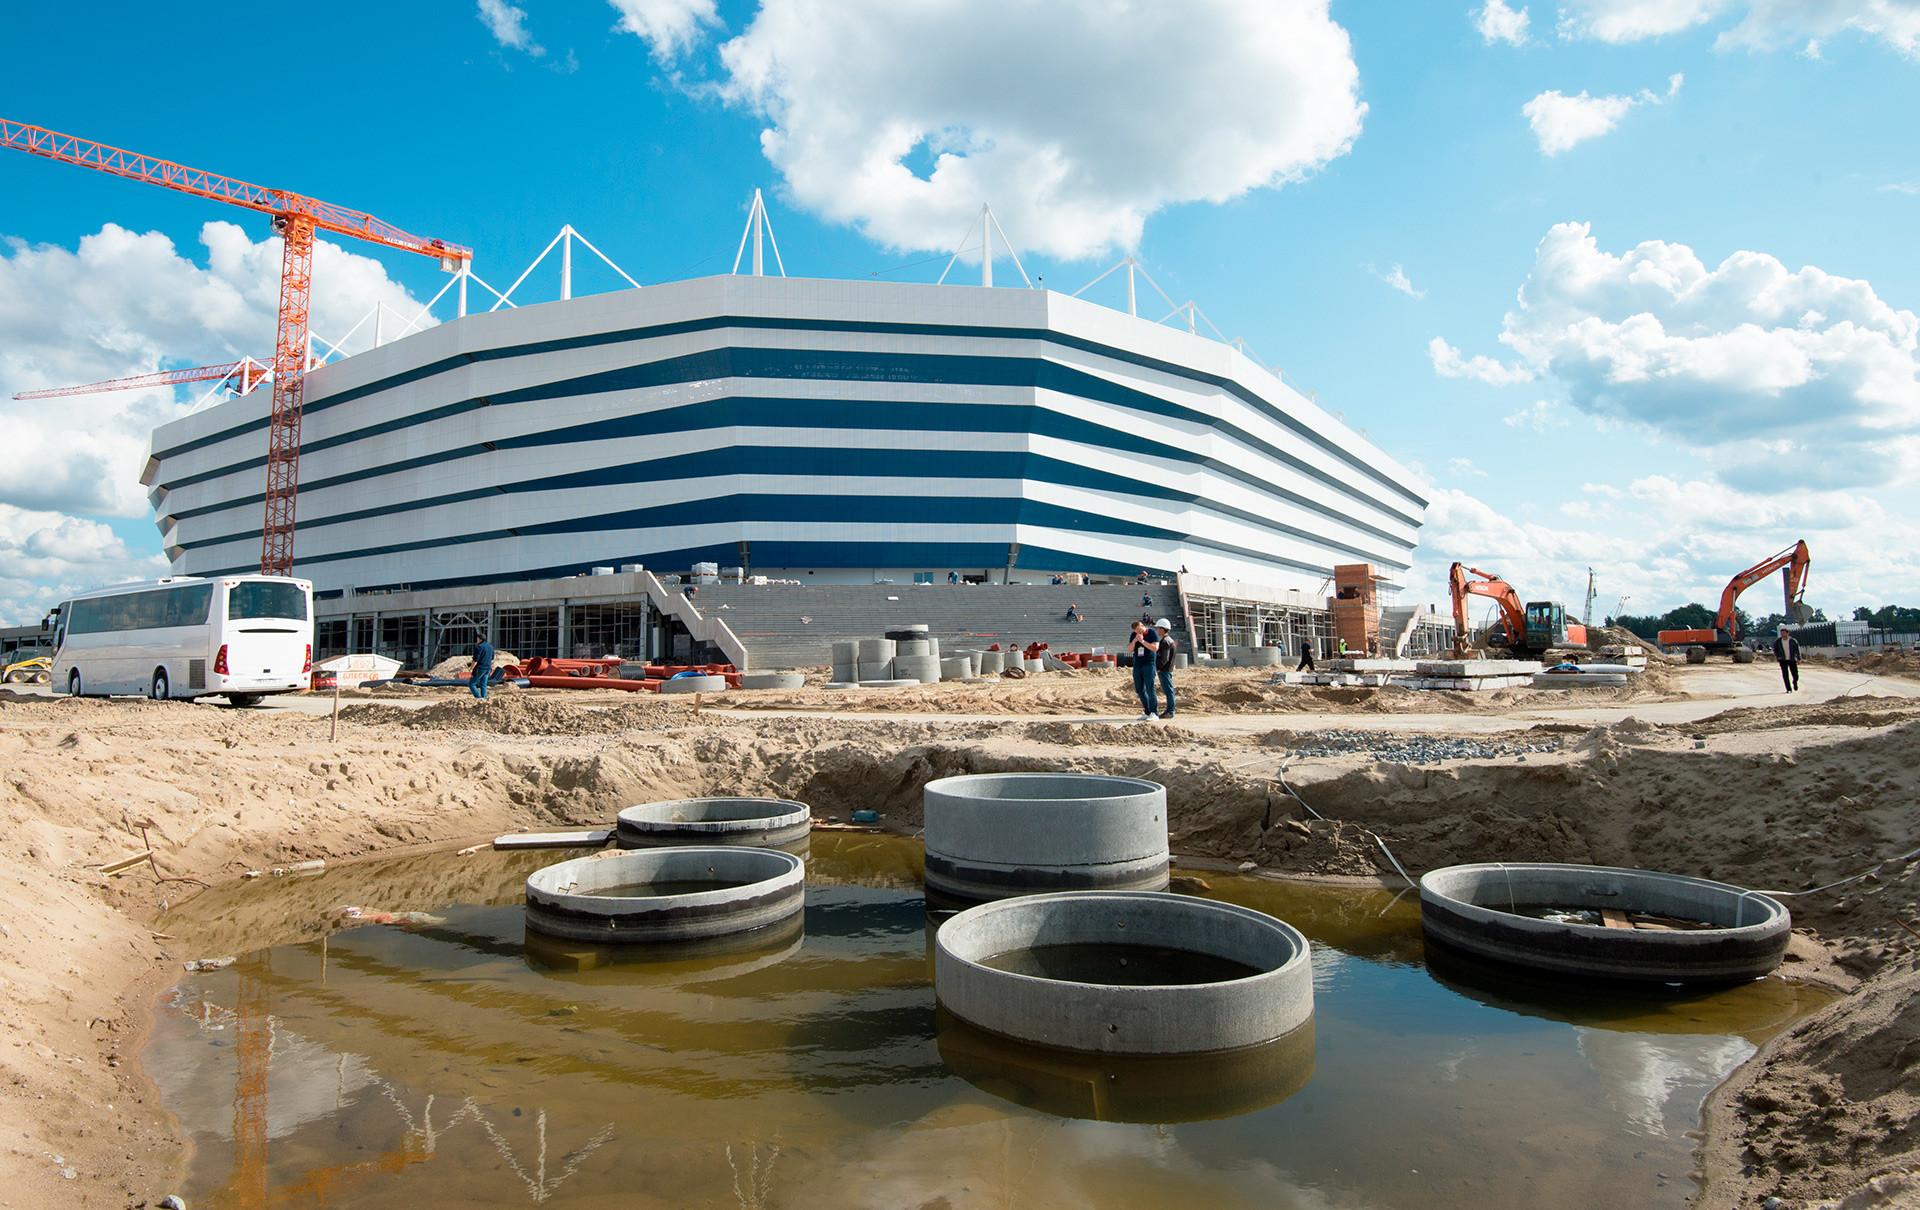 Stadion di atas Pulau Oktyabrsky di Kaliningrad.